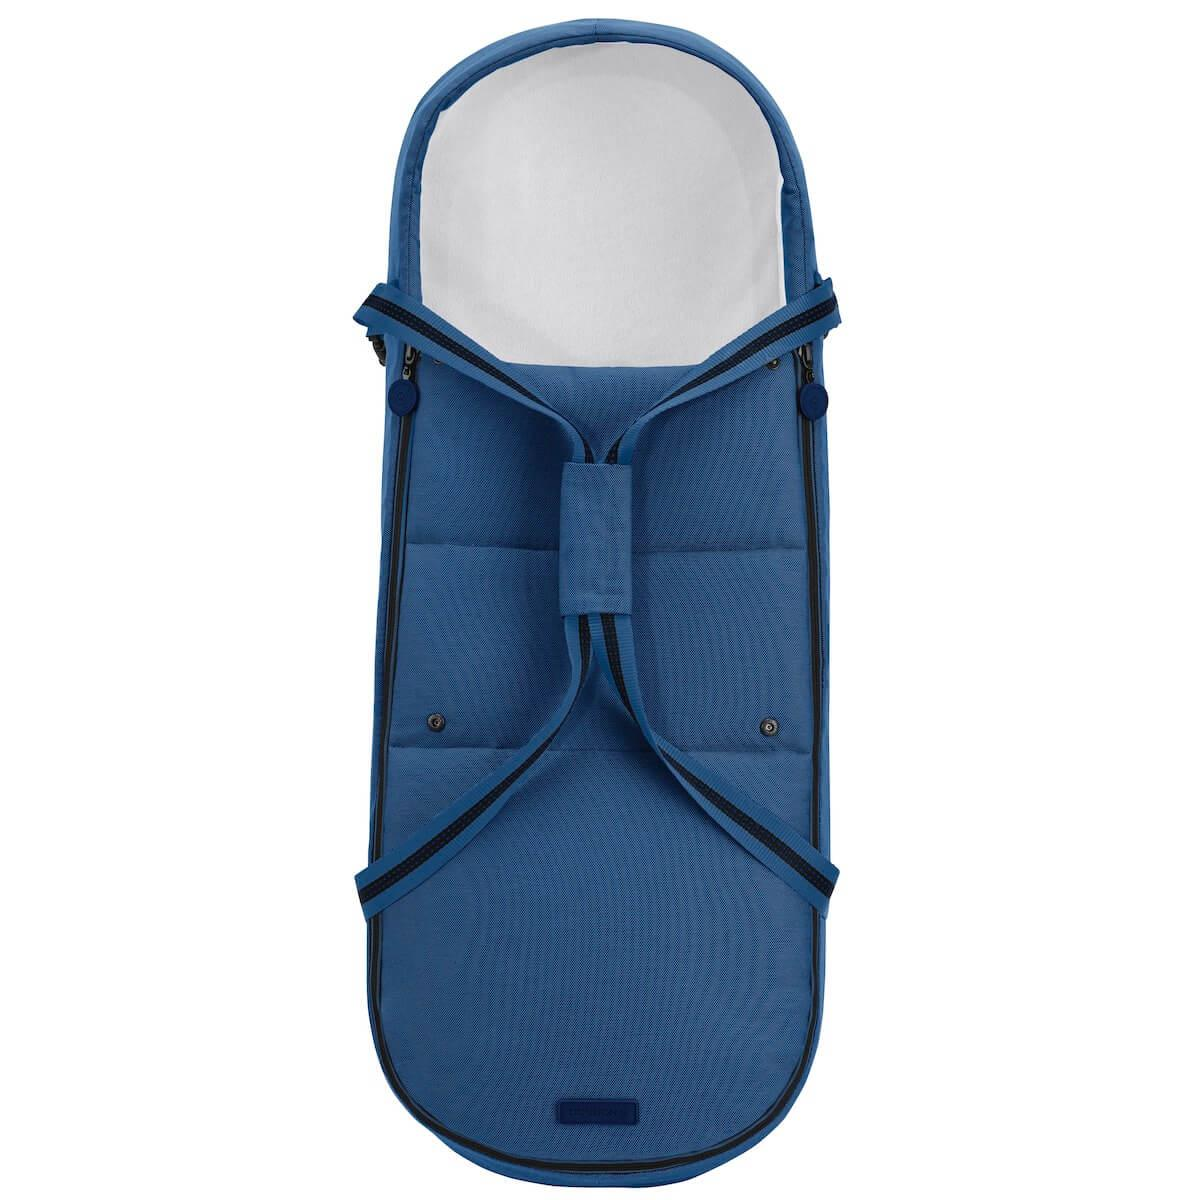 Fußsack COCOON S Cybex Navy Blue